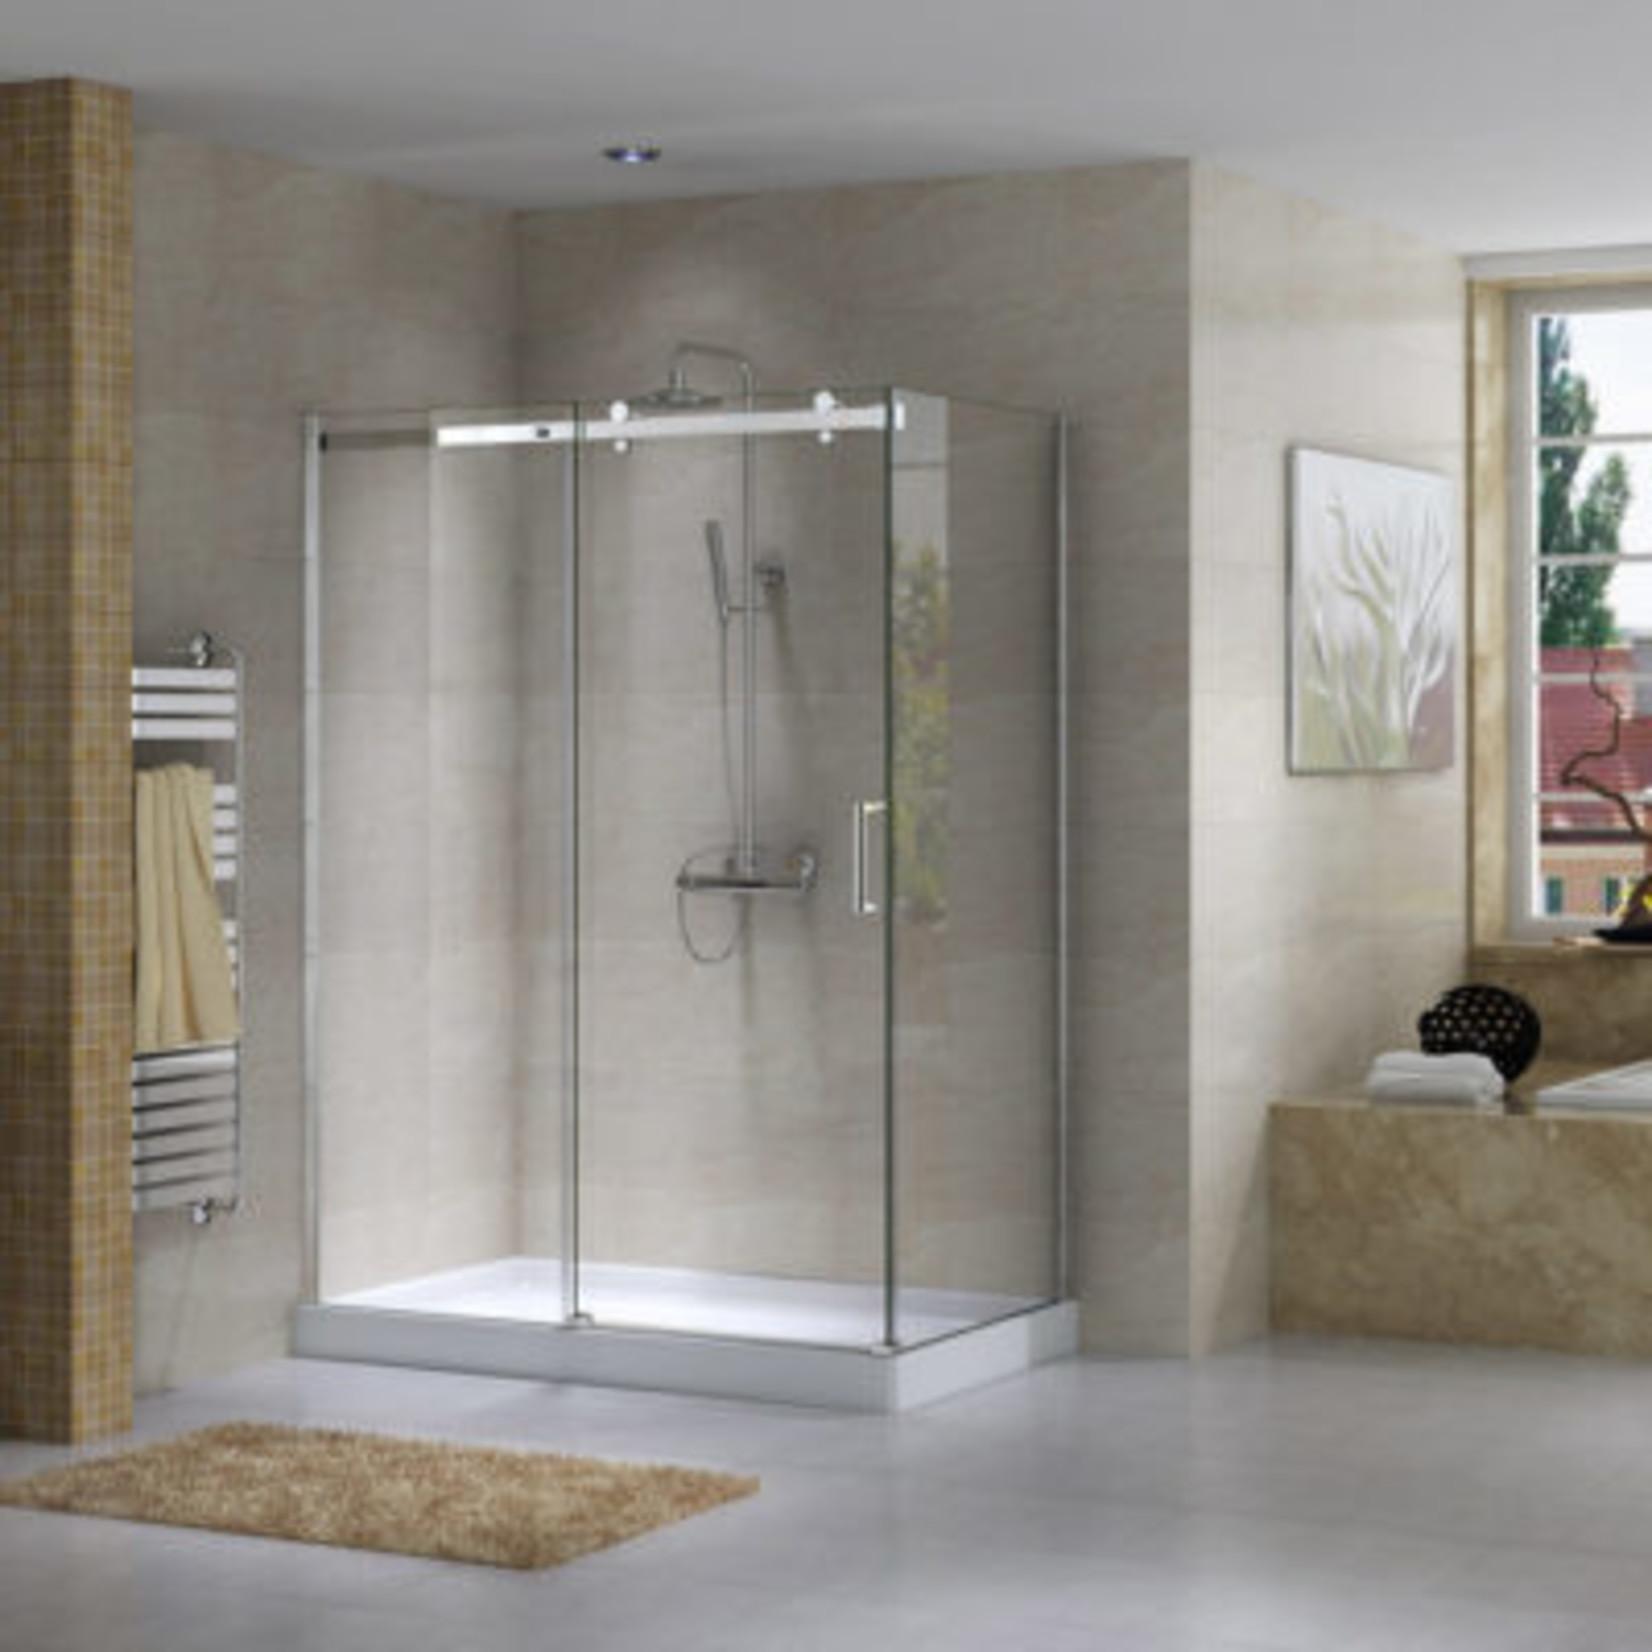 Reversible shower set 32x48 chrome Quartz Jade series